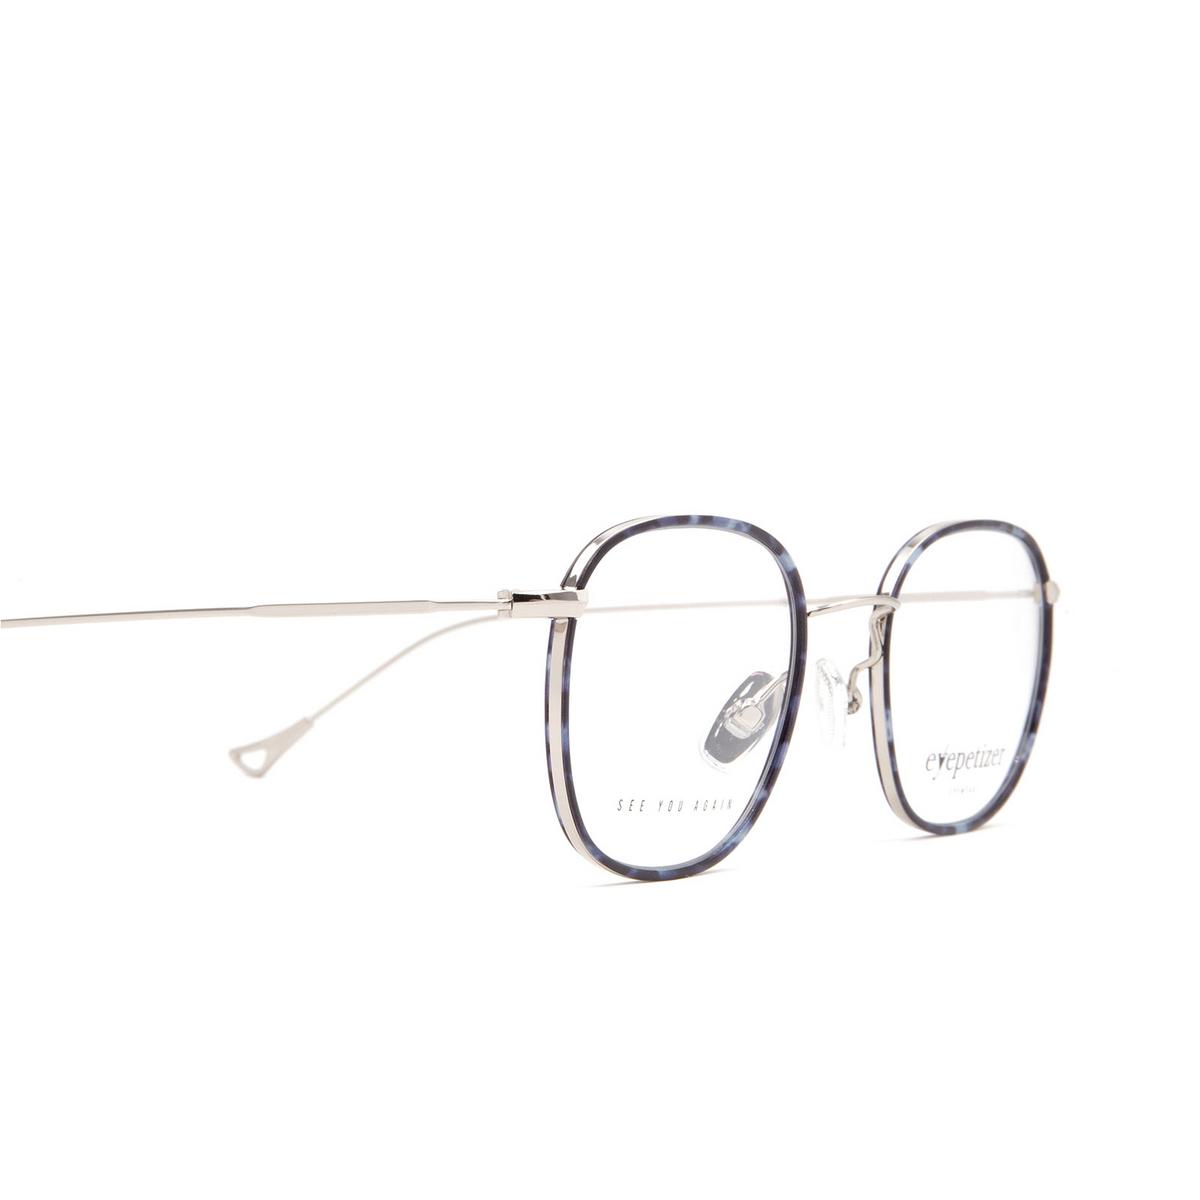 eyepetizer-thierry-c-1-k (2)